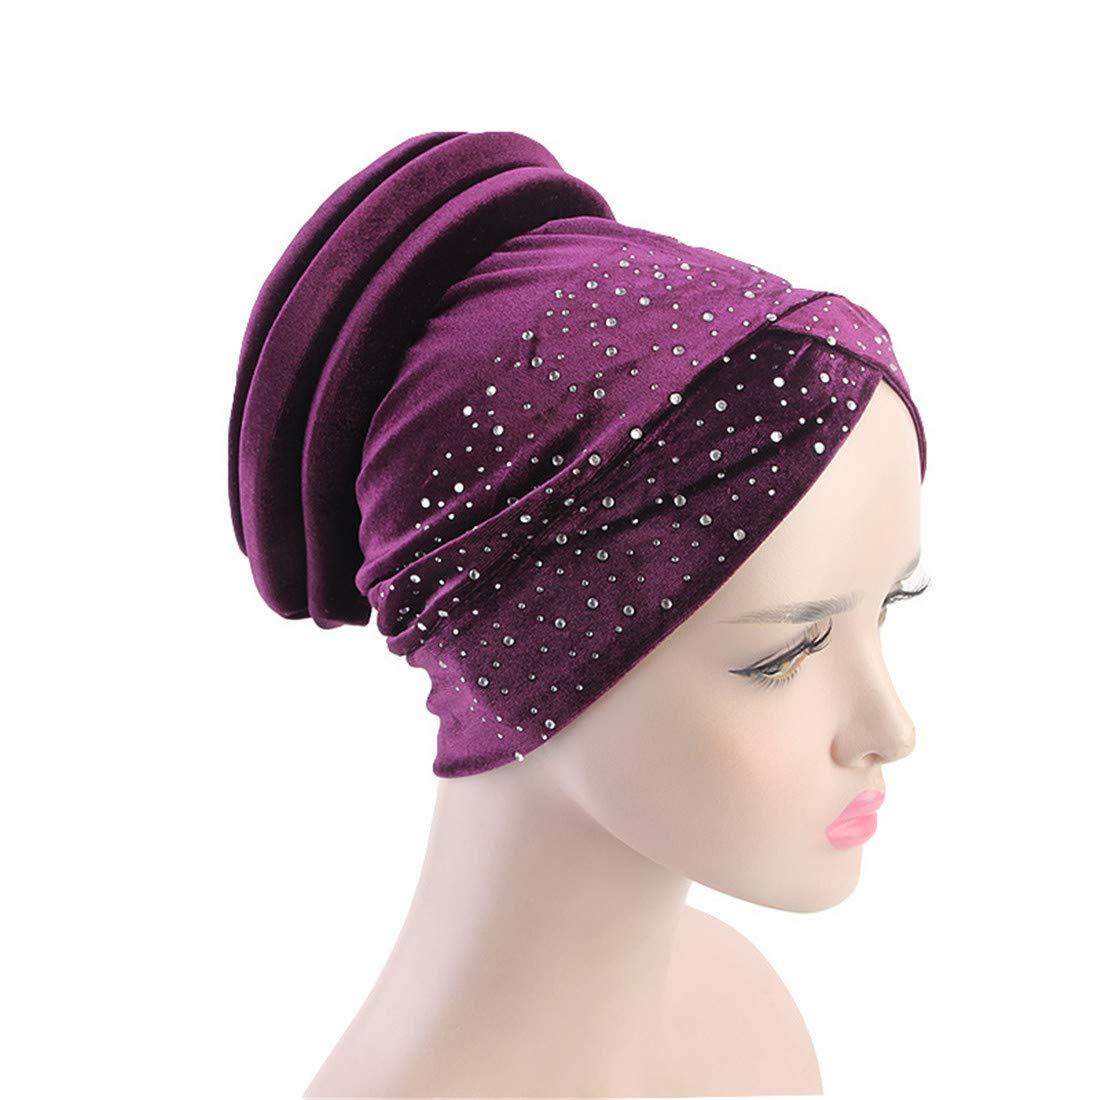 Qianmome Muslim Stretch Turban Rhinestone Velvet Beanies Autumn Gorras Mujer Hair Loss Head Scarf Wrap Hijib Cap at Amazon Womens Clothing store: